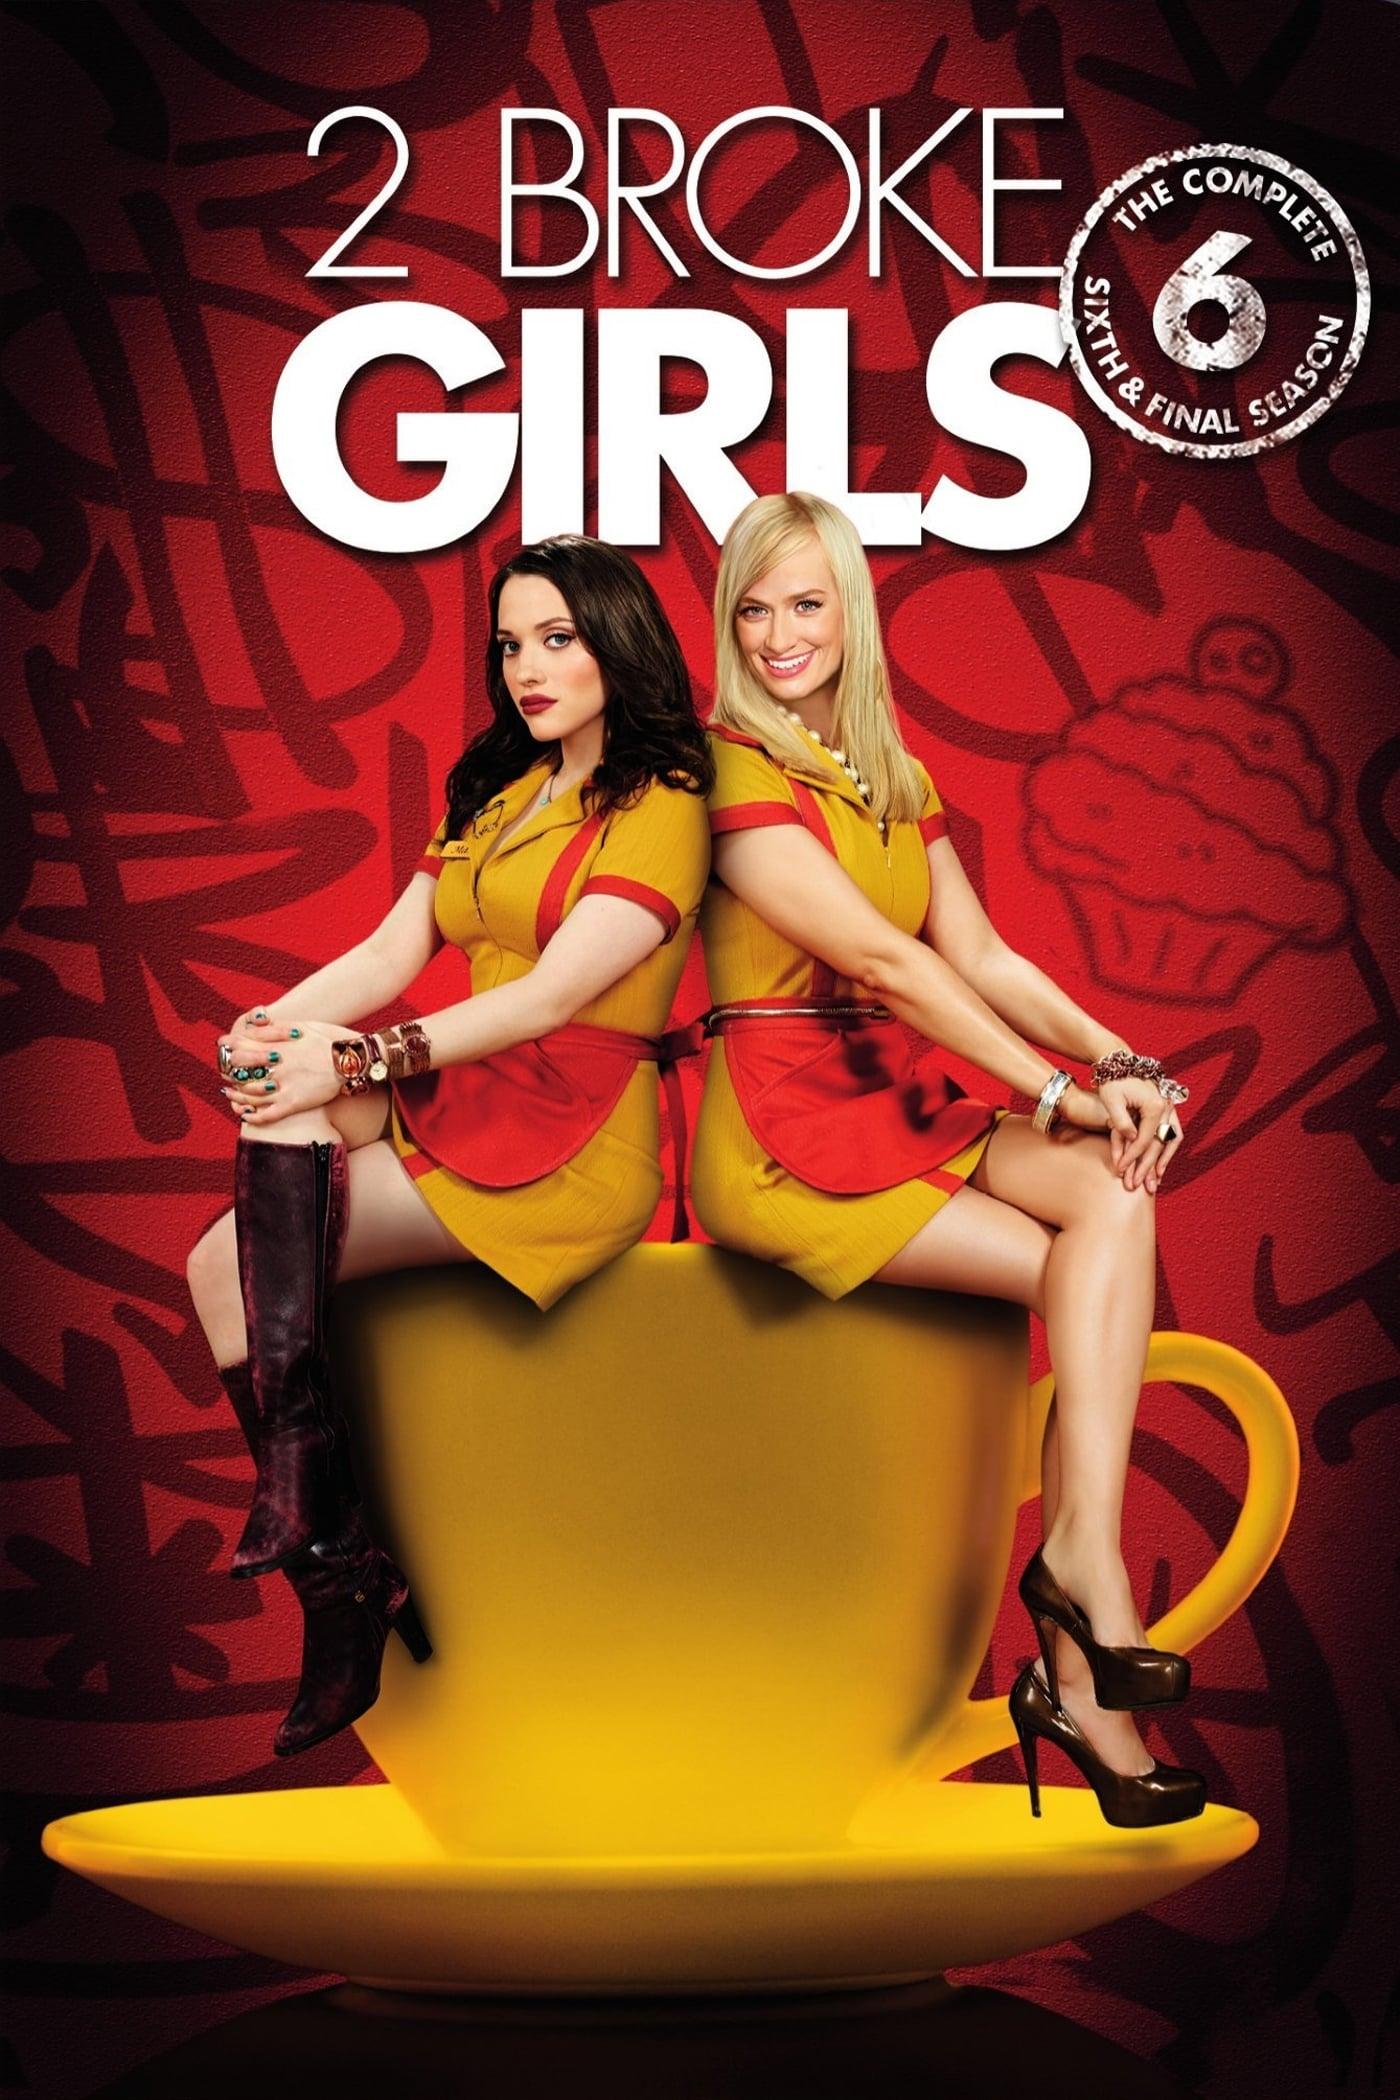 2 Broke Girls Season 6